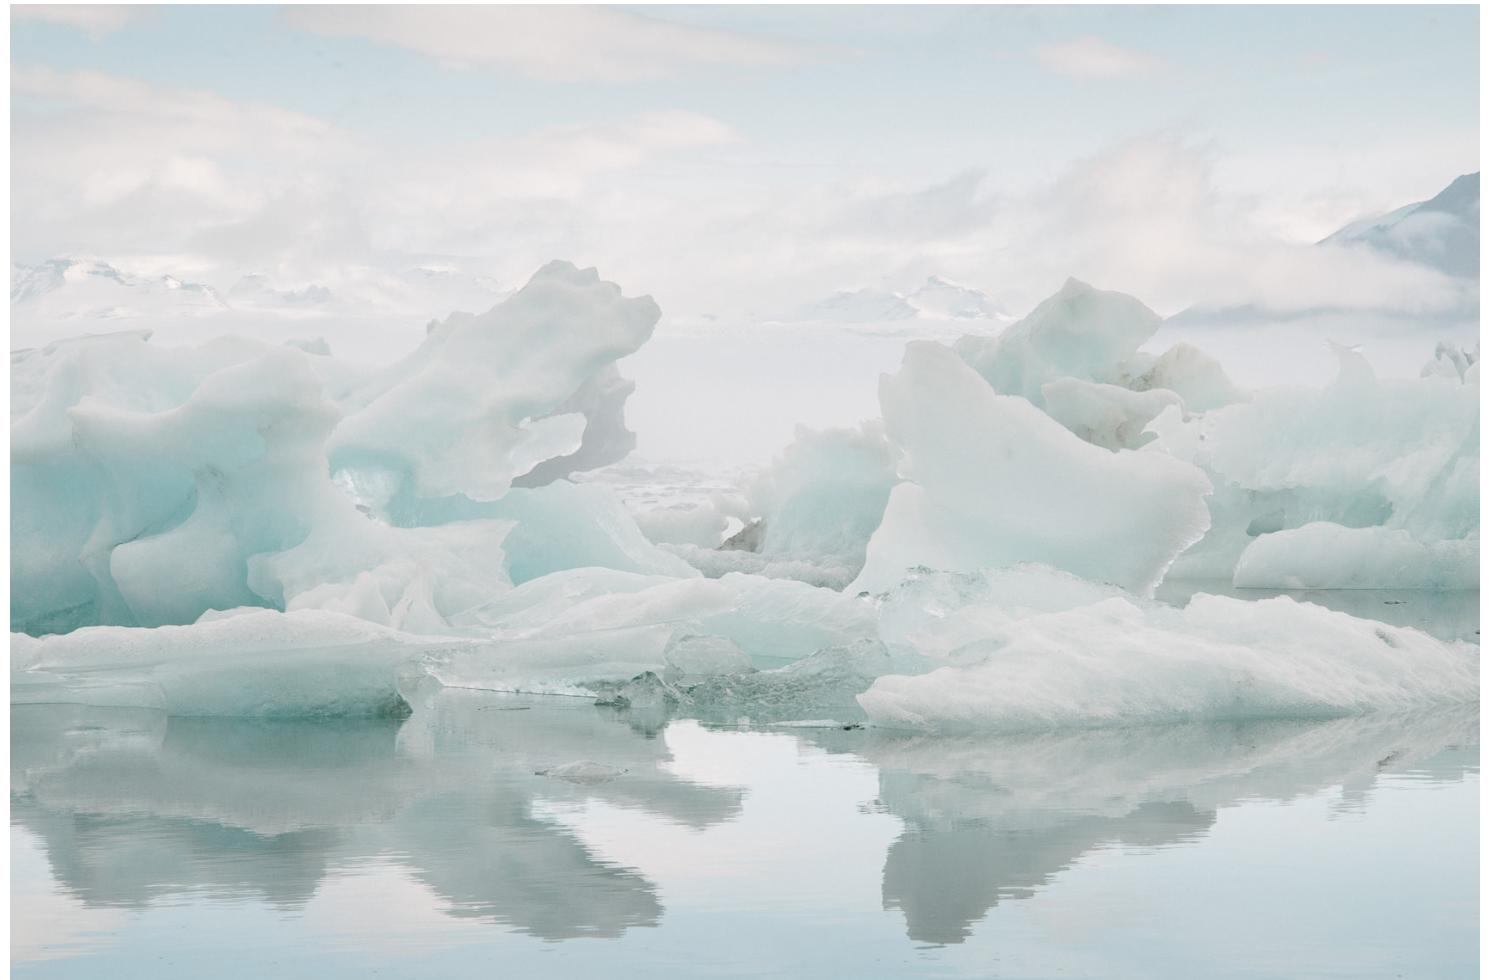 An iceberg in IIulissat, Greenland's famous Ice Fjord.